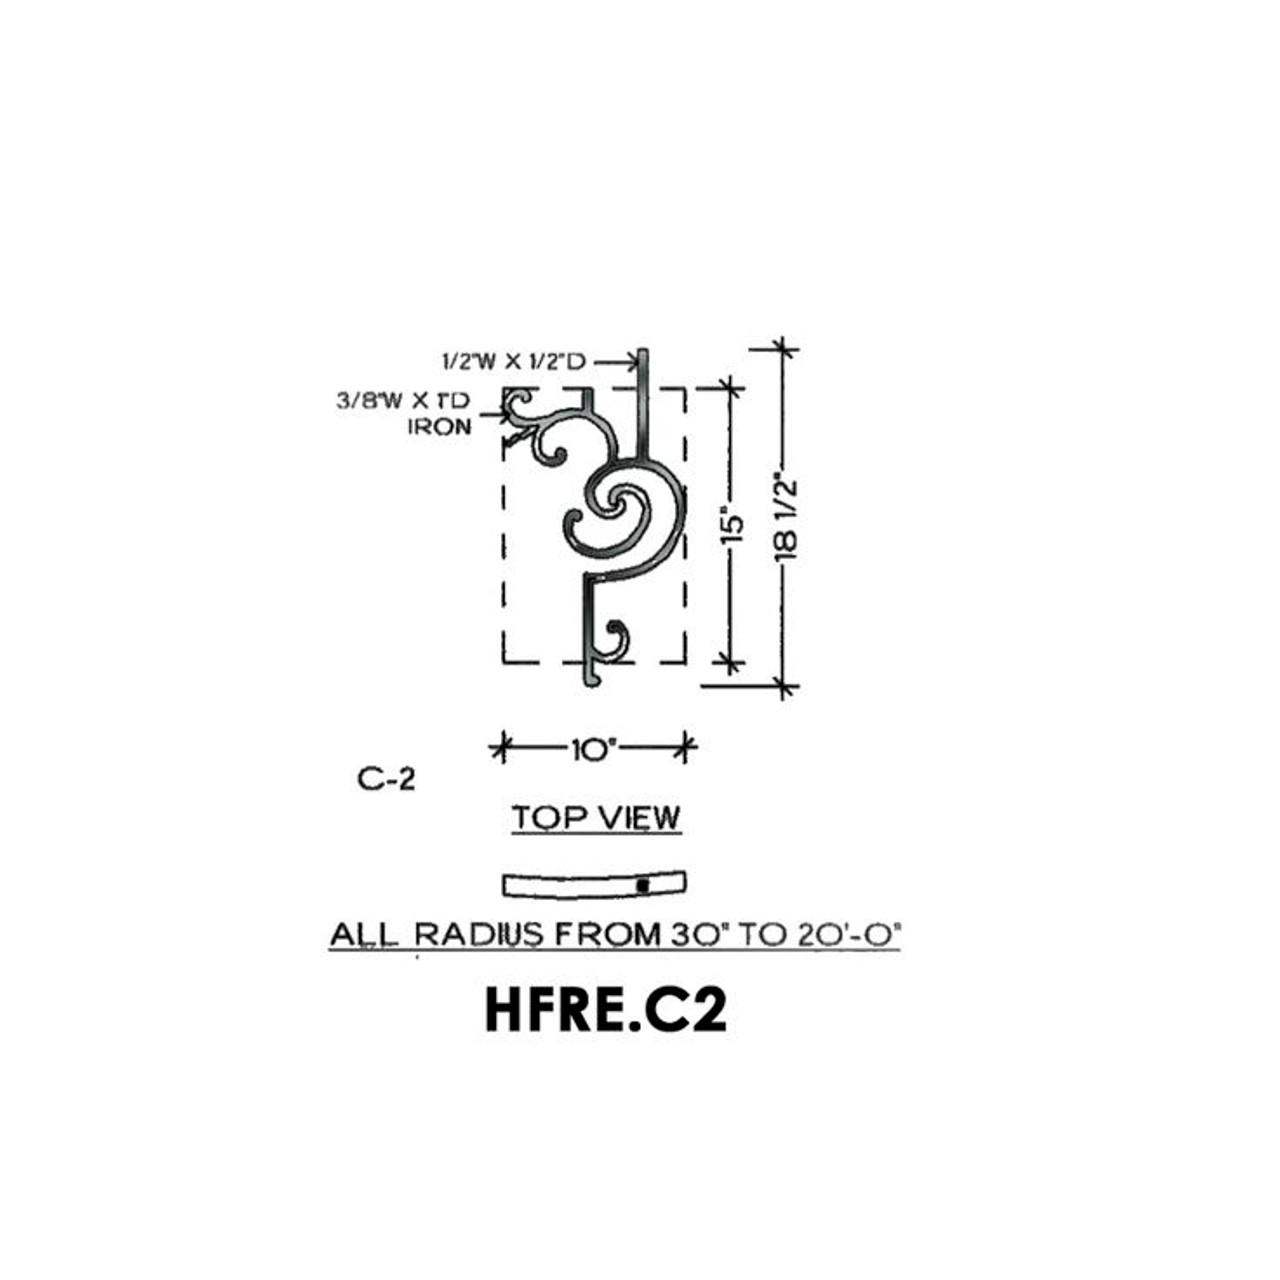 HFRE.C2 Regency Curved Half Height Rake Panel